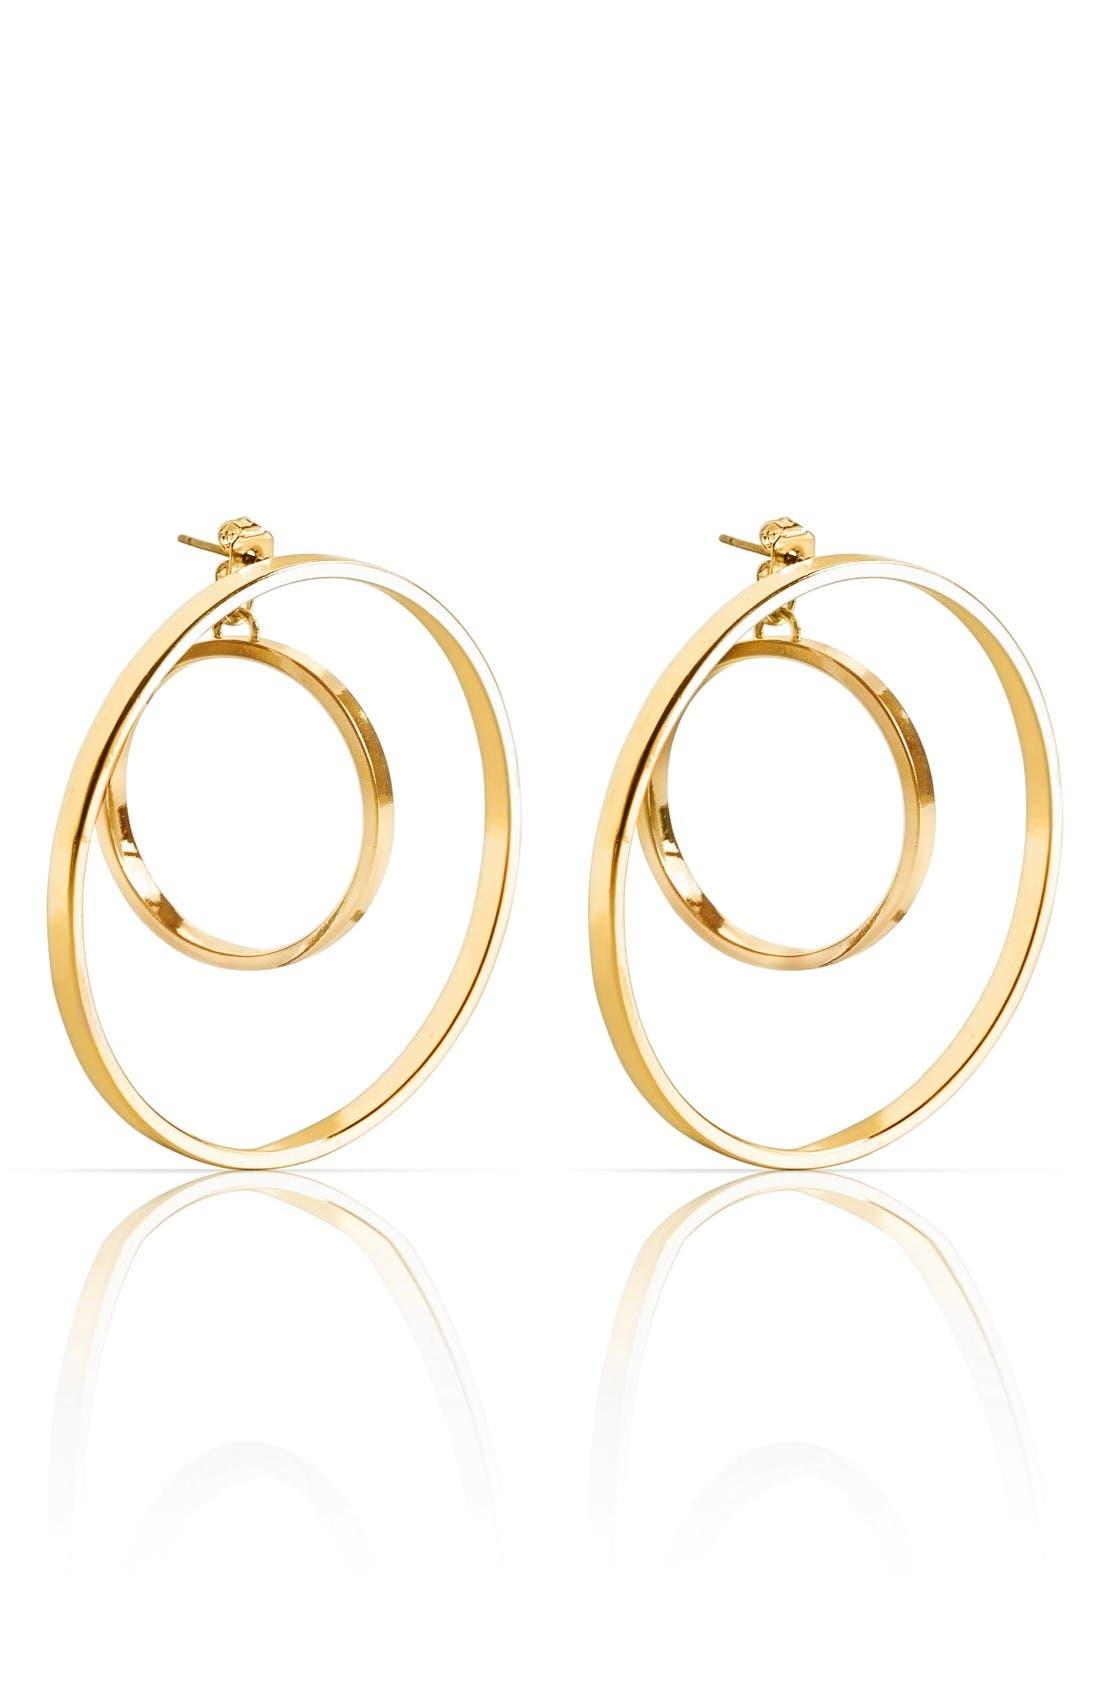 Alternate Image 1 Selected - Jenny Bird Rise Hoop Earrings